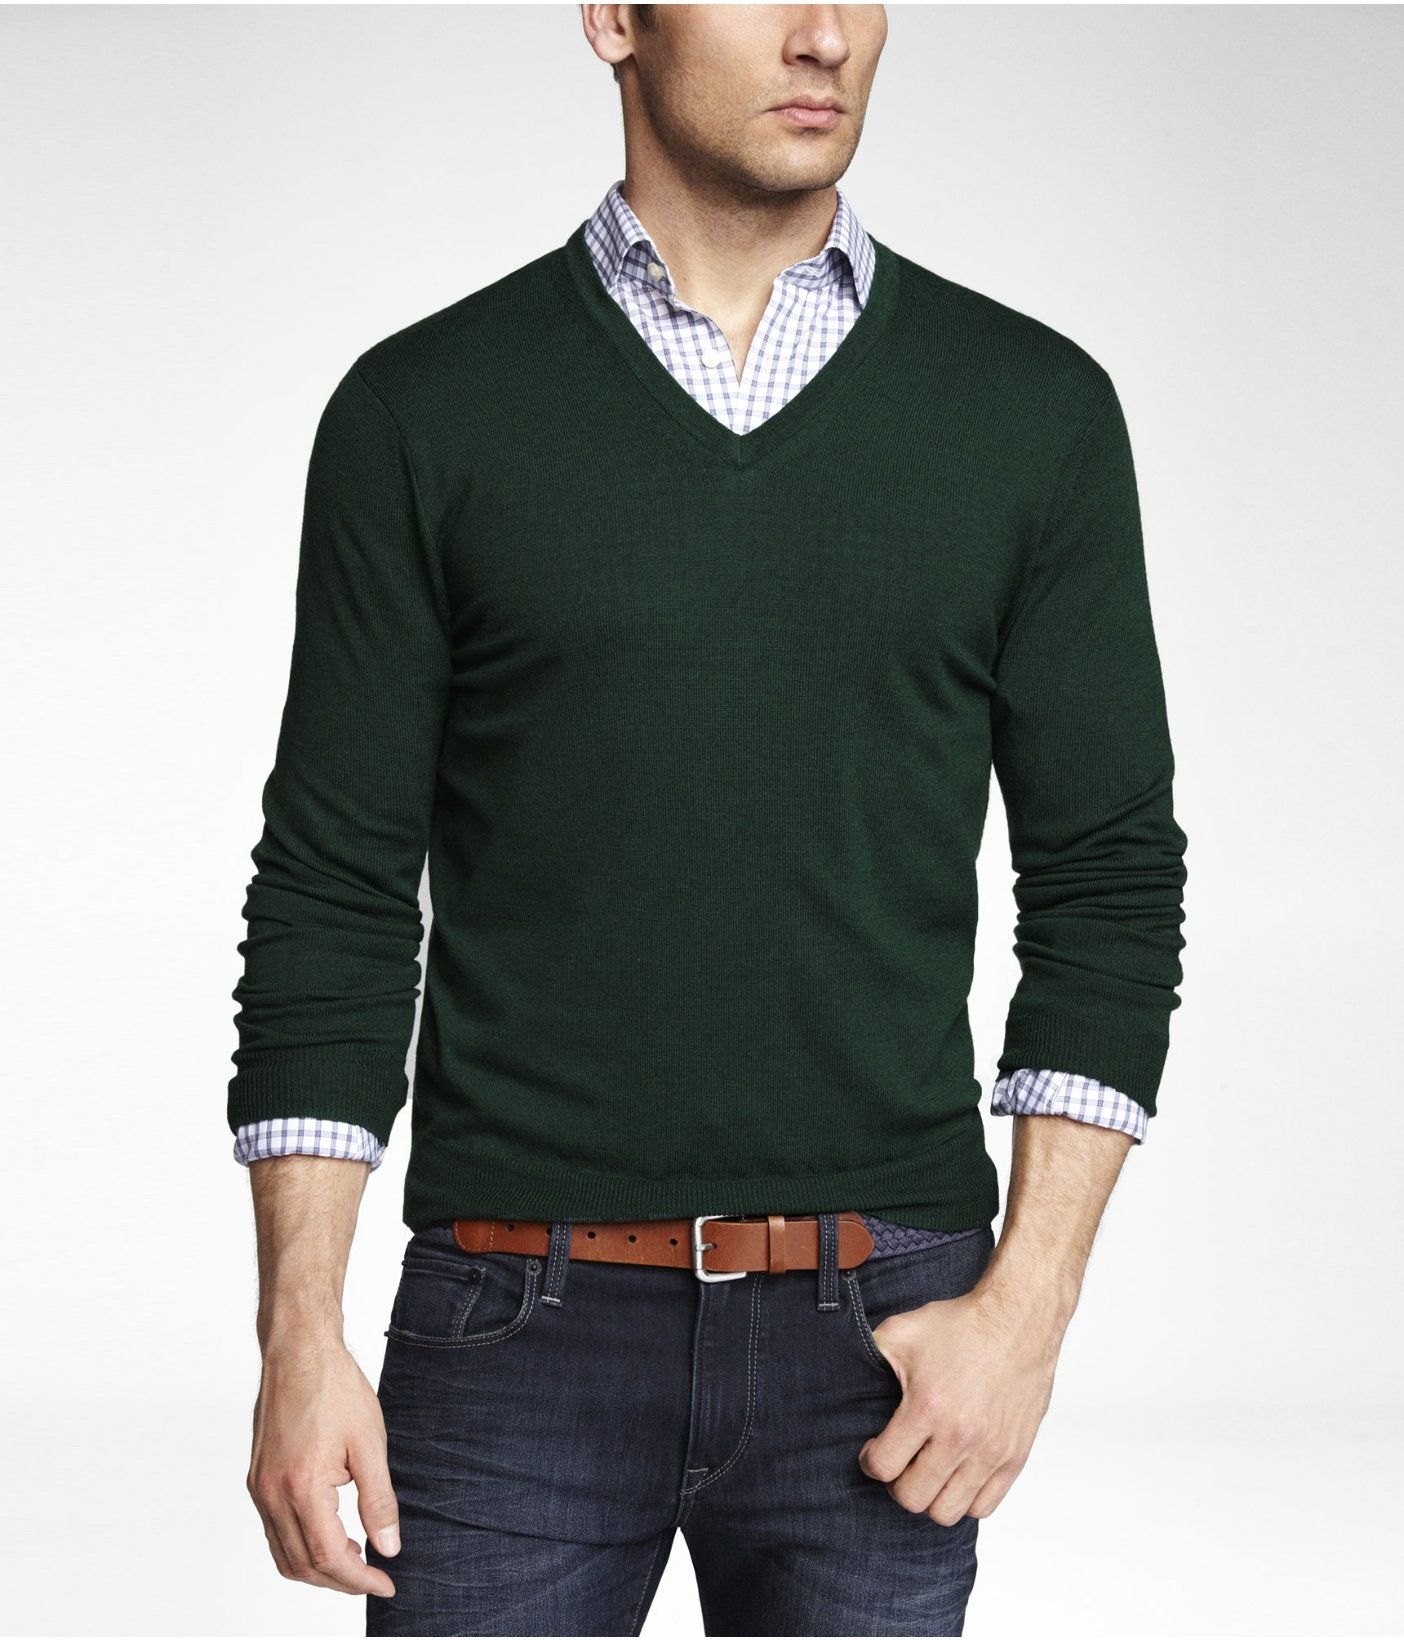 Green merino sweater, light blue gingham shirt, leather